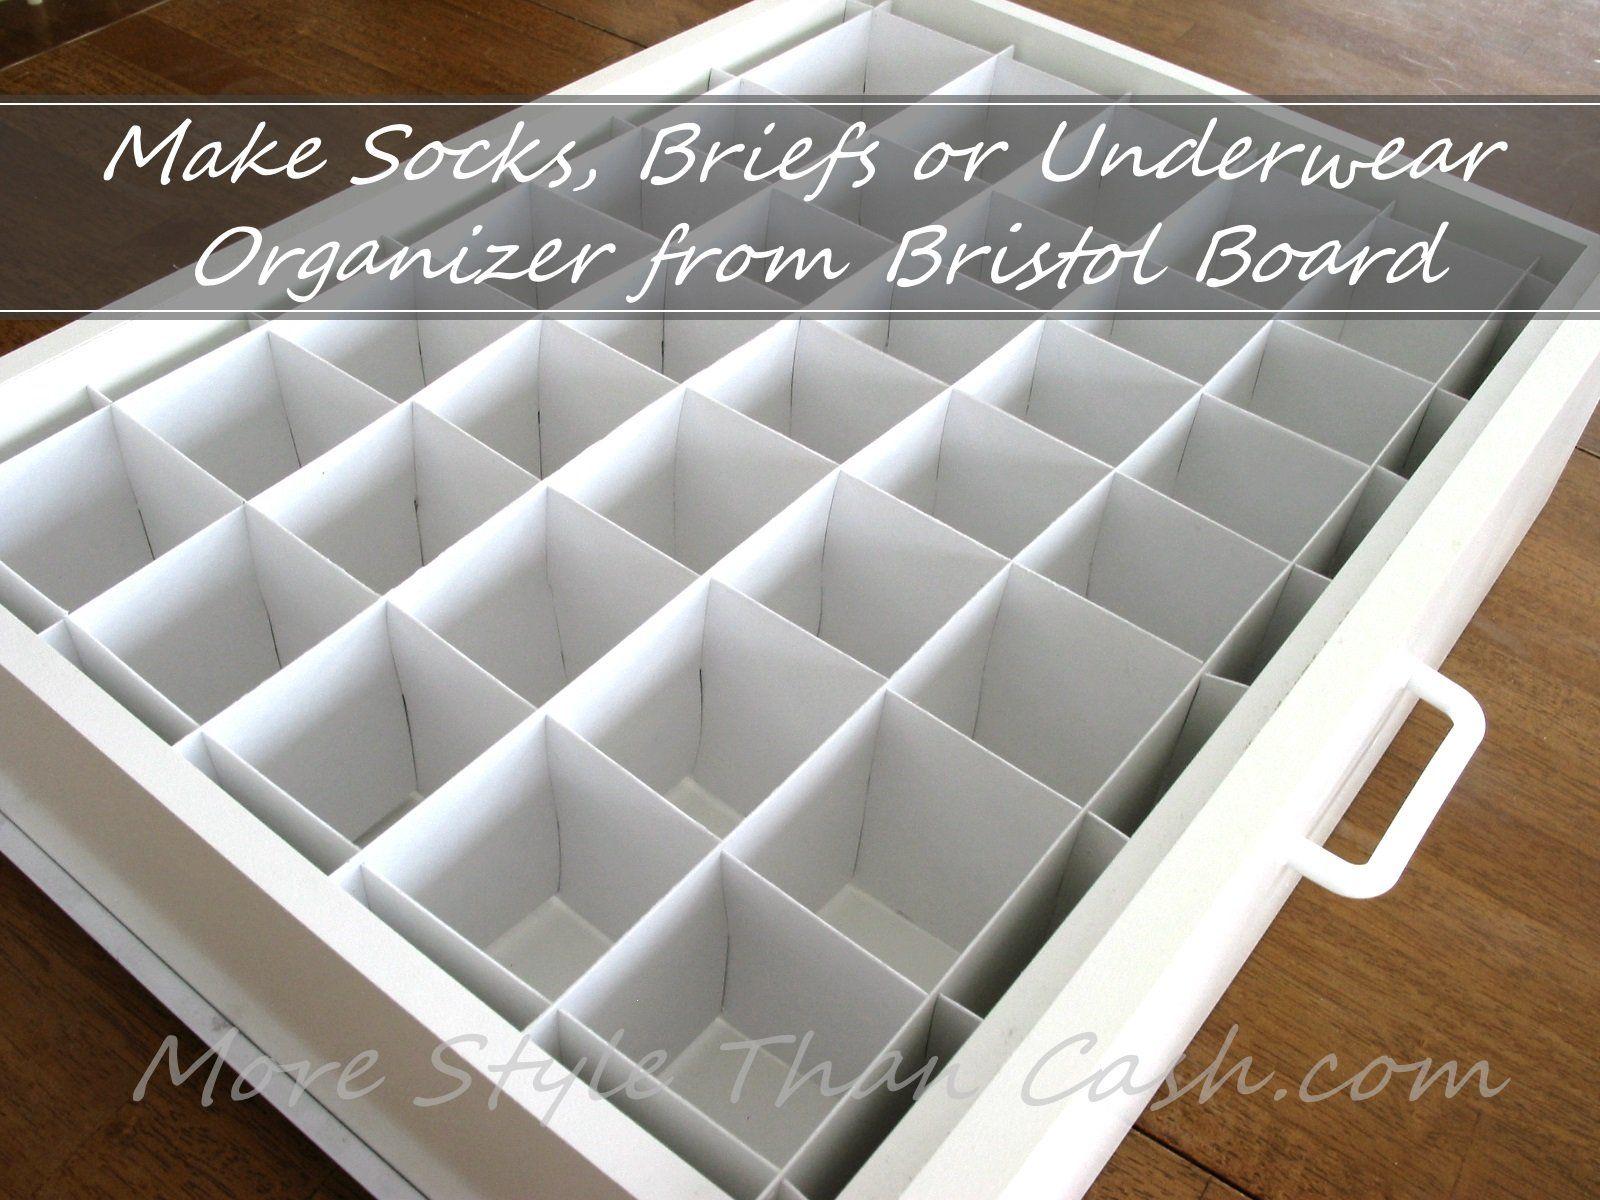 Make Socks Organizer From Bristol Board Diy Drawer Organizer